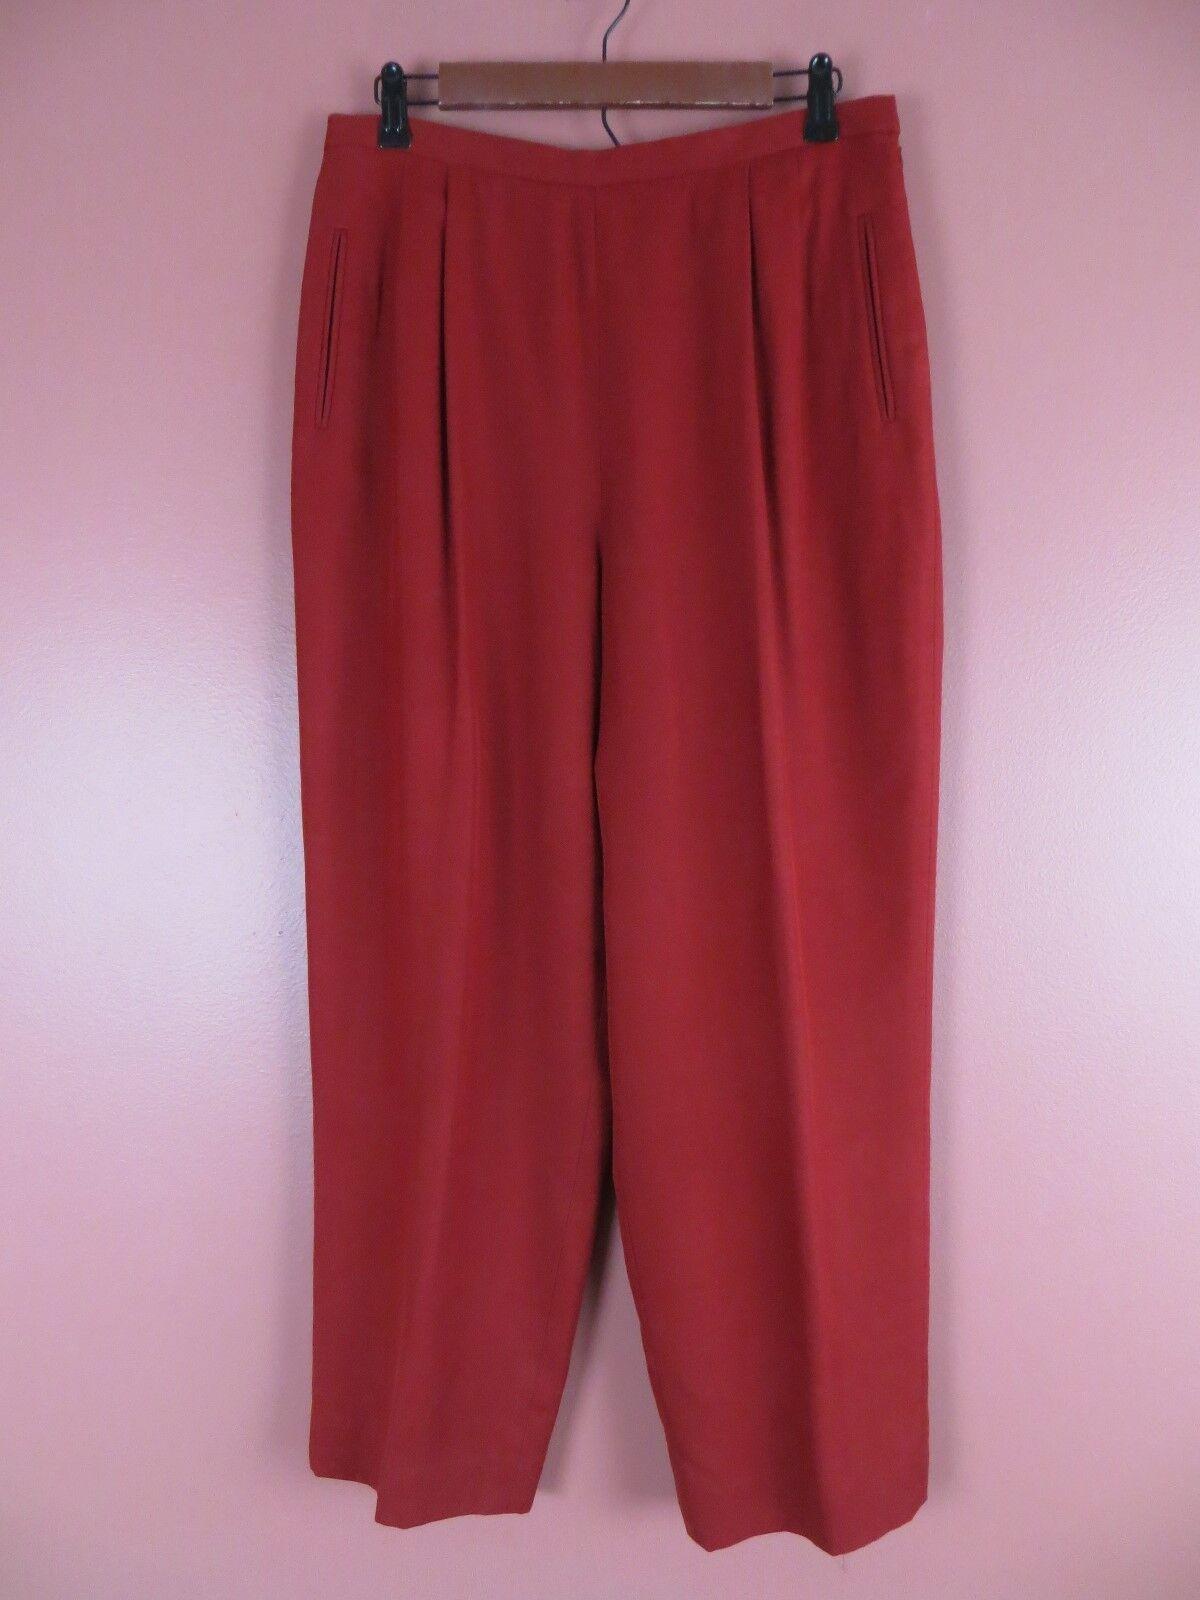 PNS0945-VALERIE STEVENS Womens Silk Dress Pants Pleat Front Dark Red Sz 14P MINT